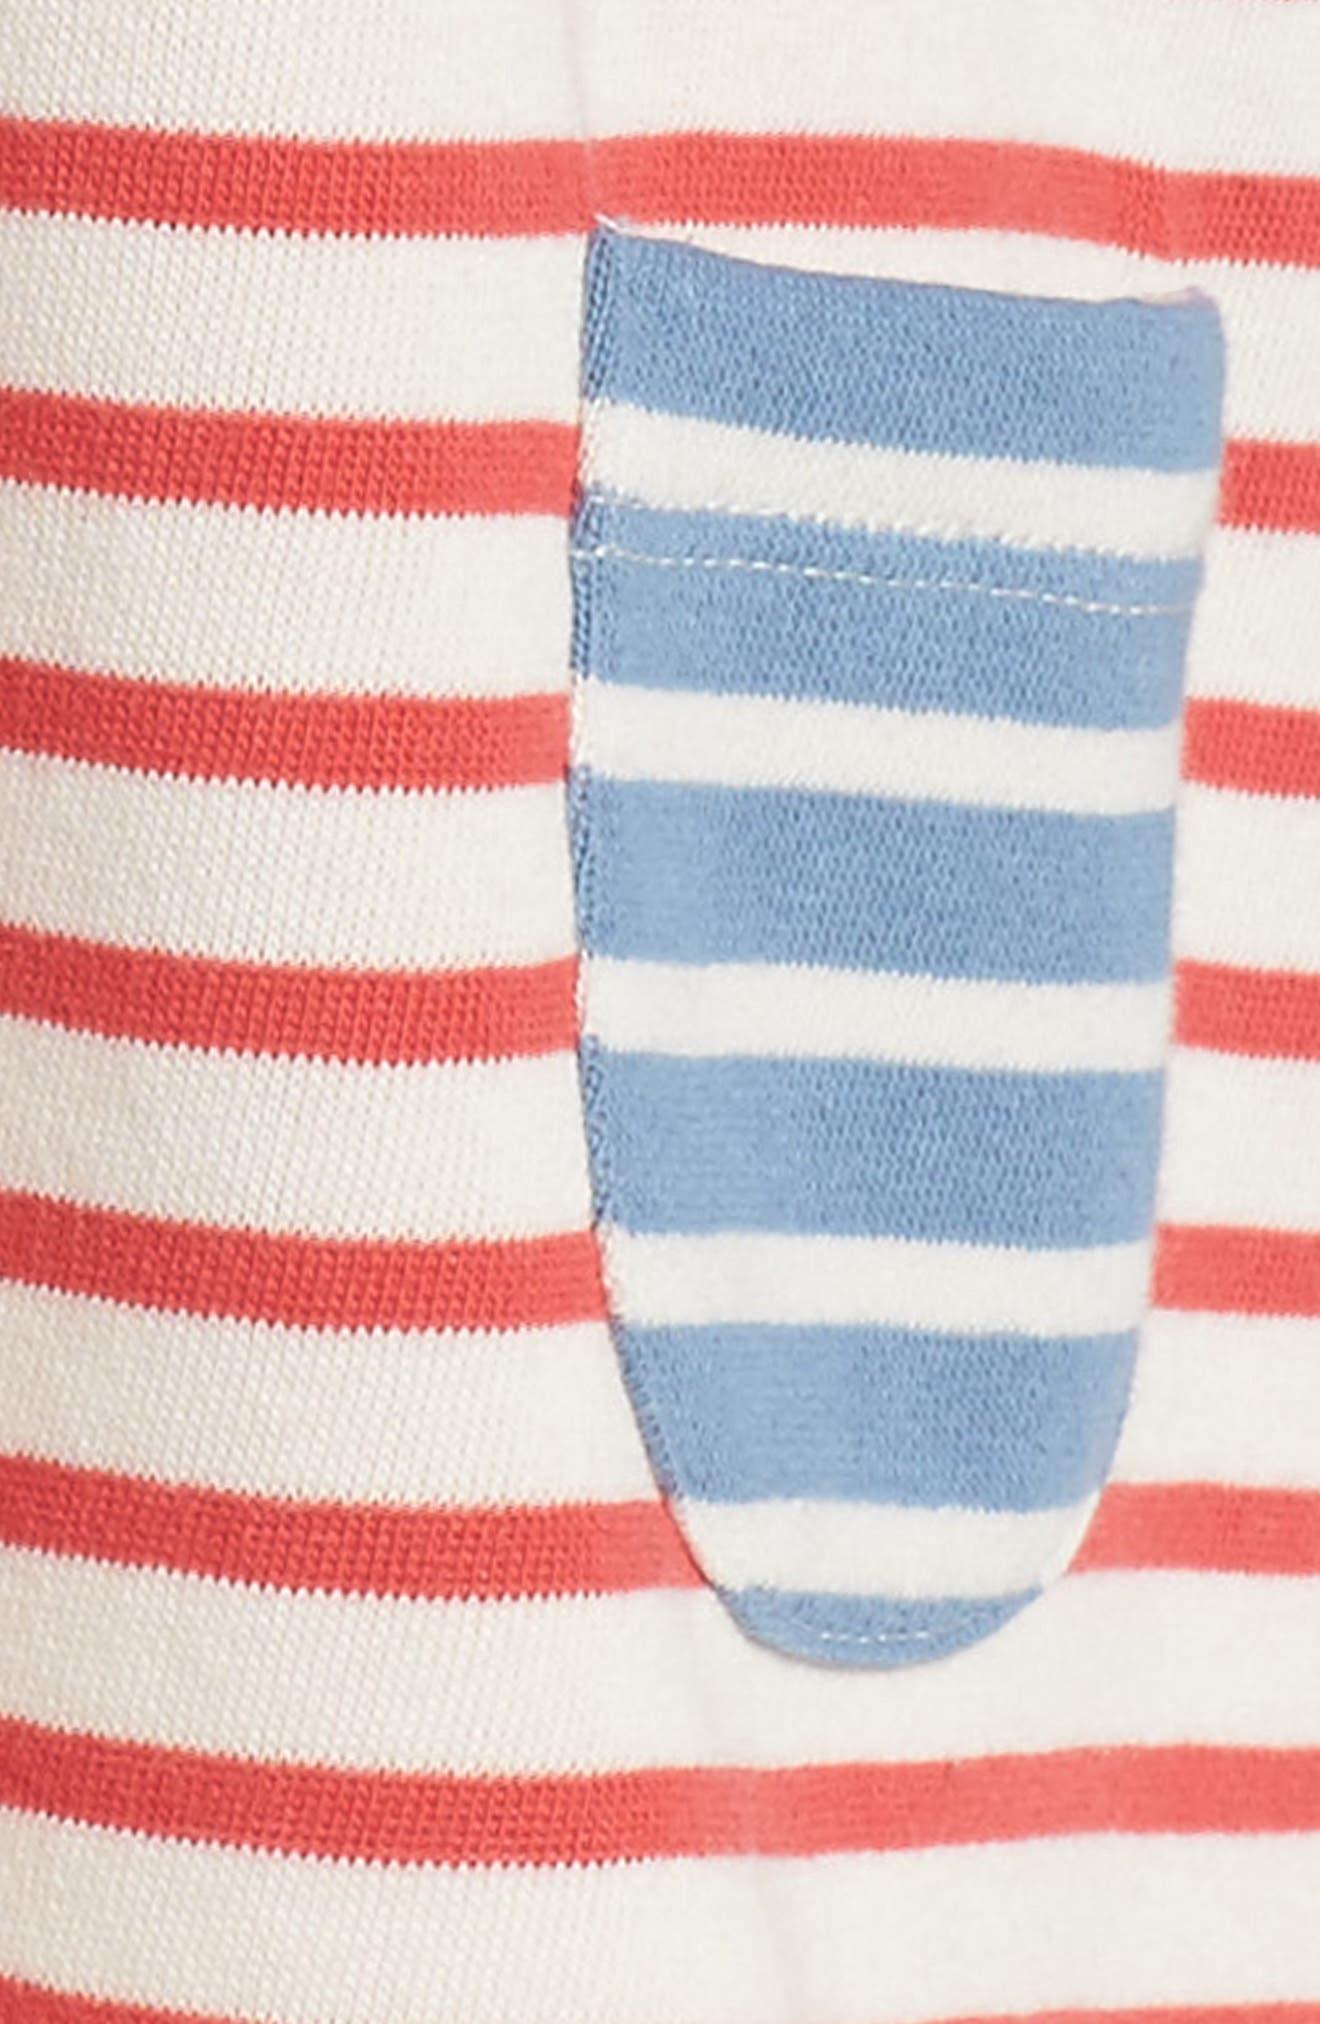 Alternate Image 3  - Mini Boden Cosy Peter Pan Collar Sweatshirt Dress (Baby Girls & Toddler Girls)